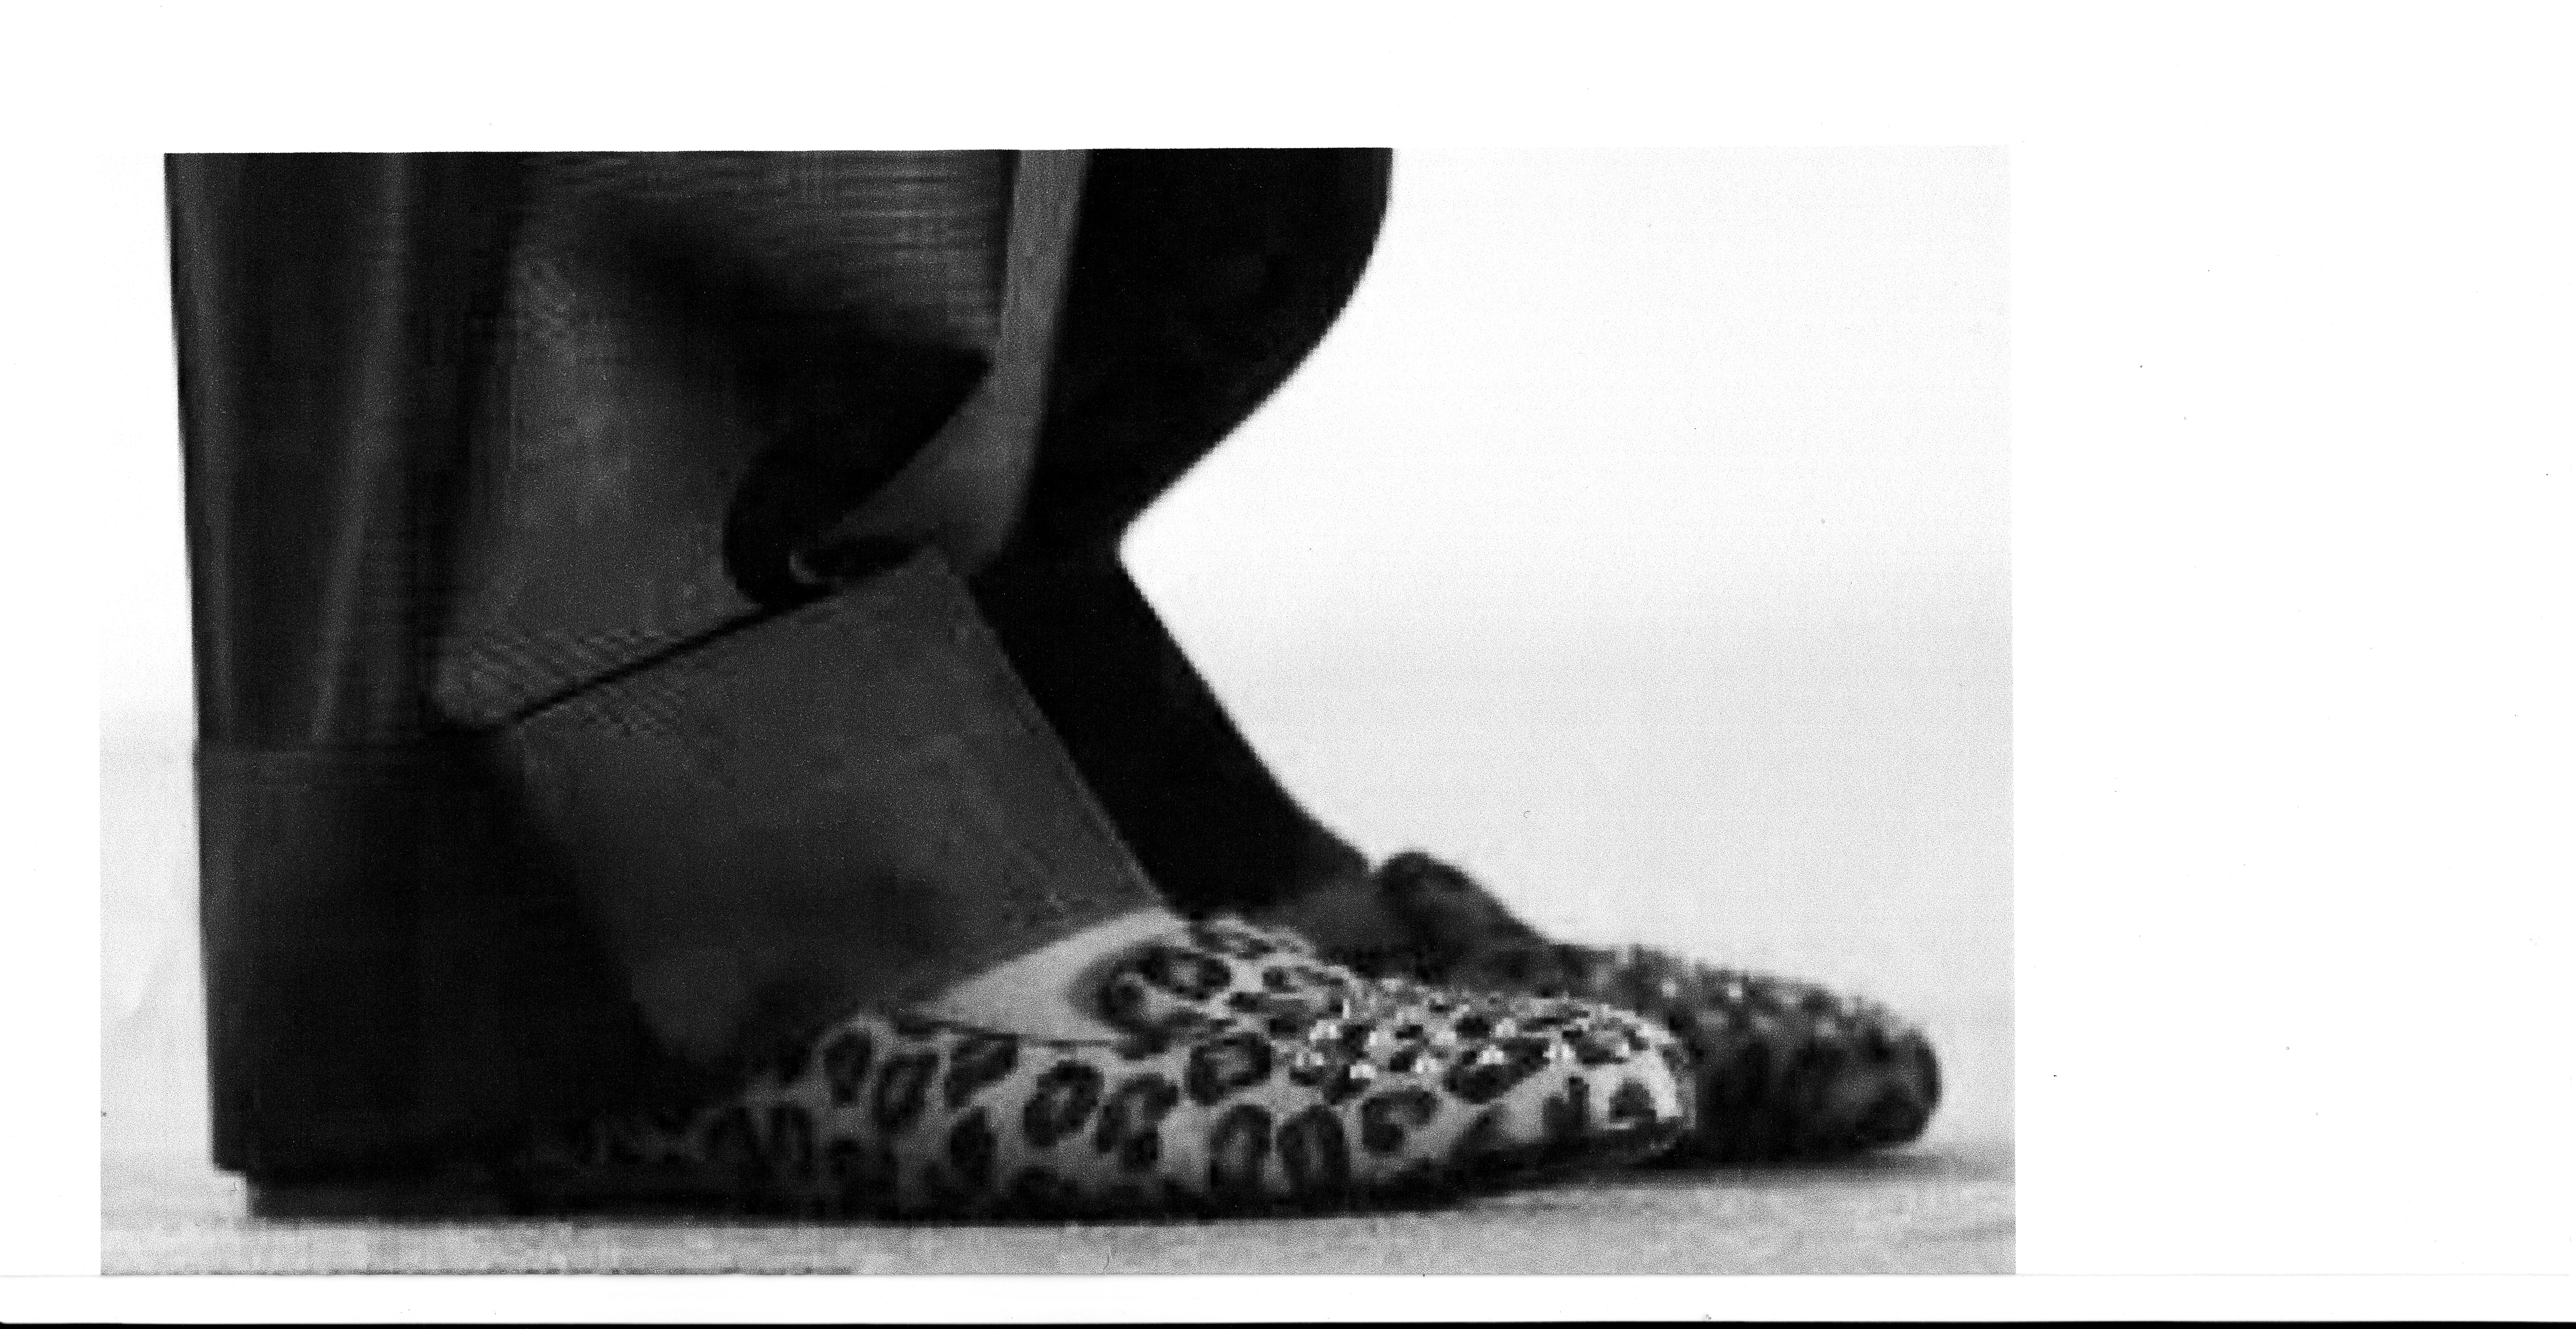 LeopardSkinShoe_160715.jpg